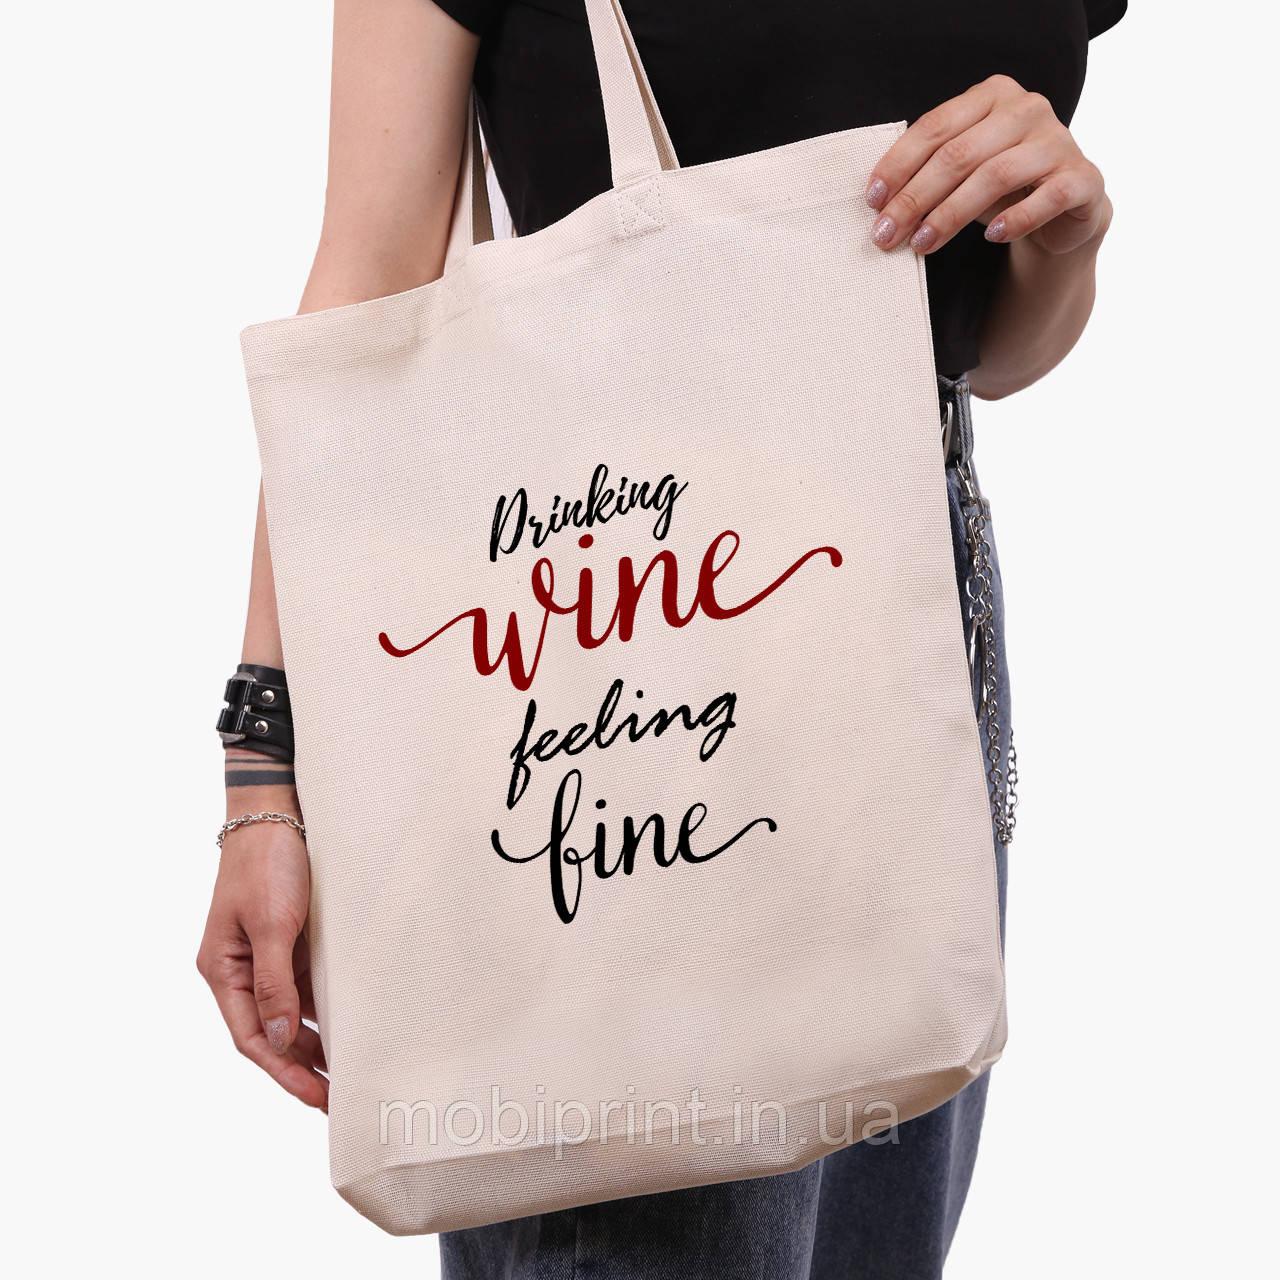 Эко сумка шоппер белая Вино (Drinking wine feeling fine) (9227-2612-1)  41*39*8 см